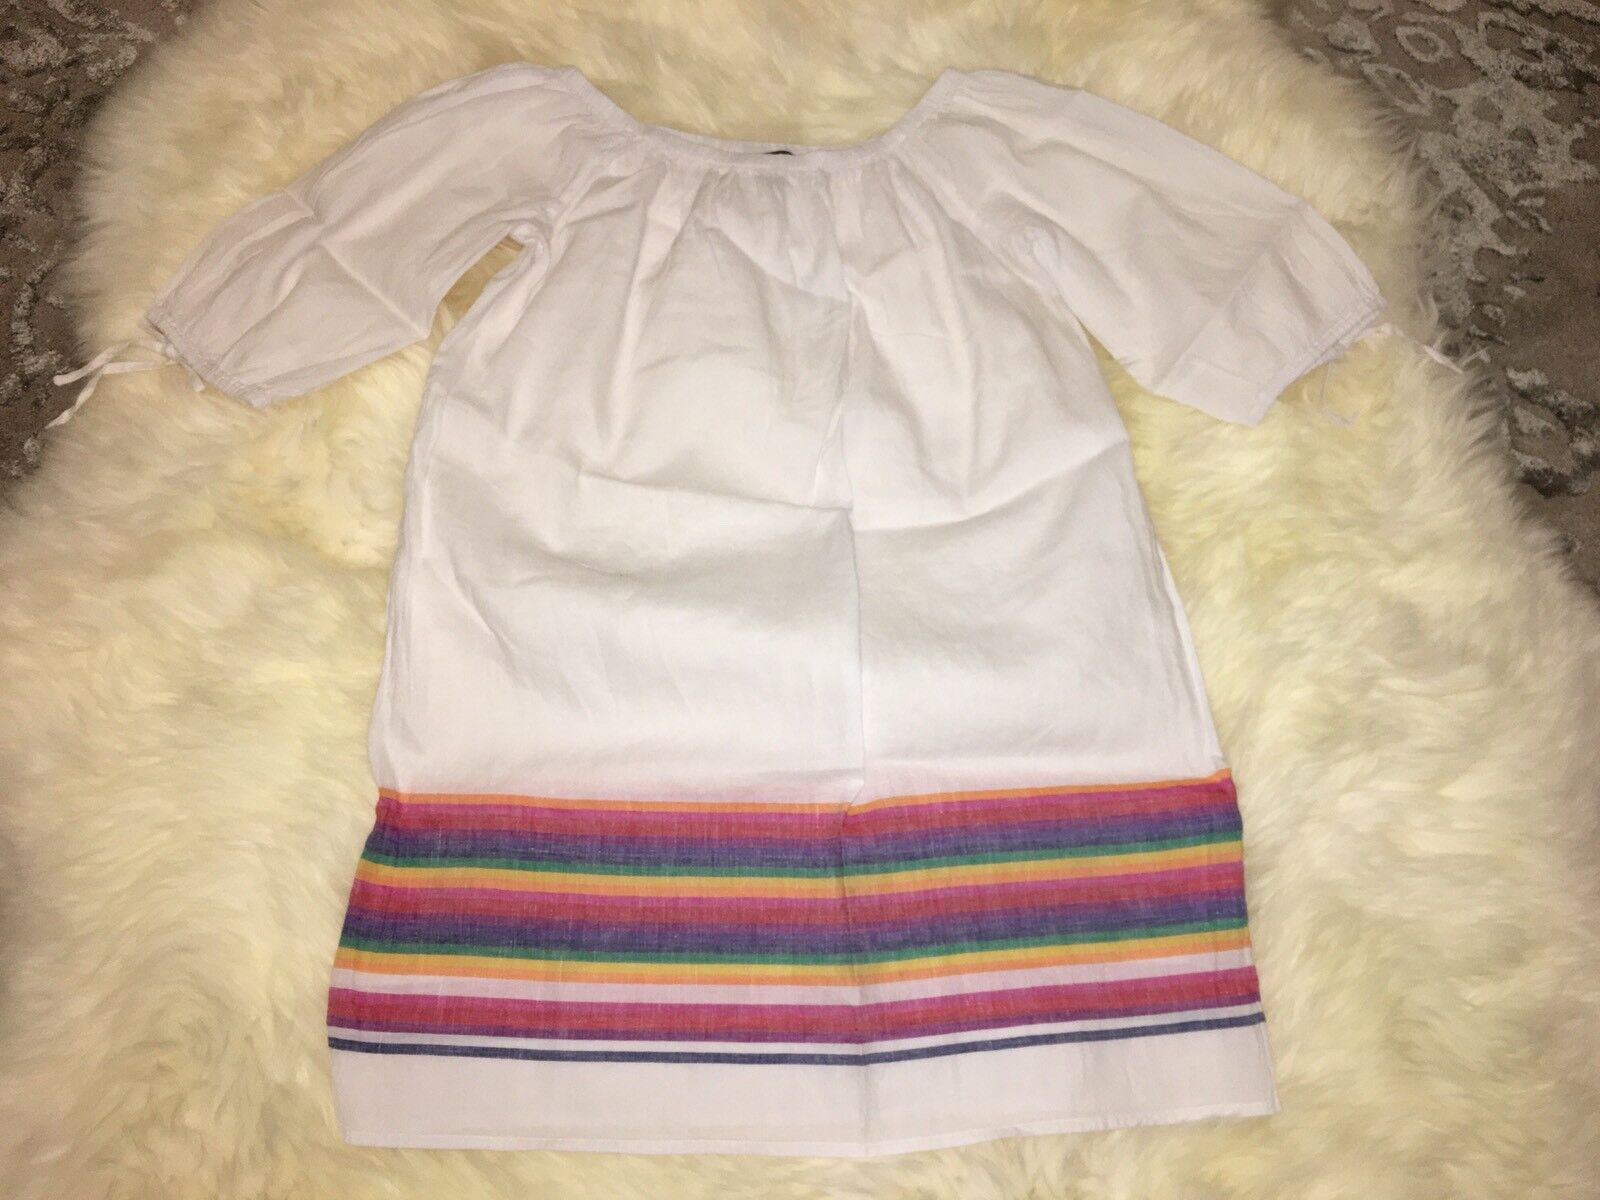 NWT J Crew White Off-the-shoulder Beach Beach Beach Dress with Rainbow Stripes Sz M G6010 f9db30